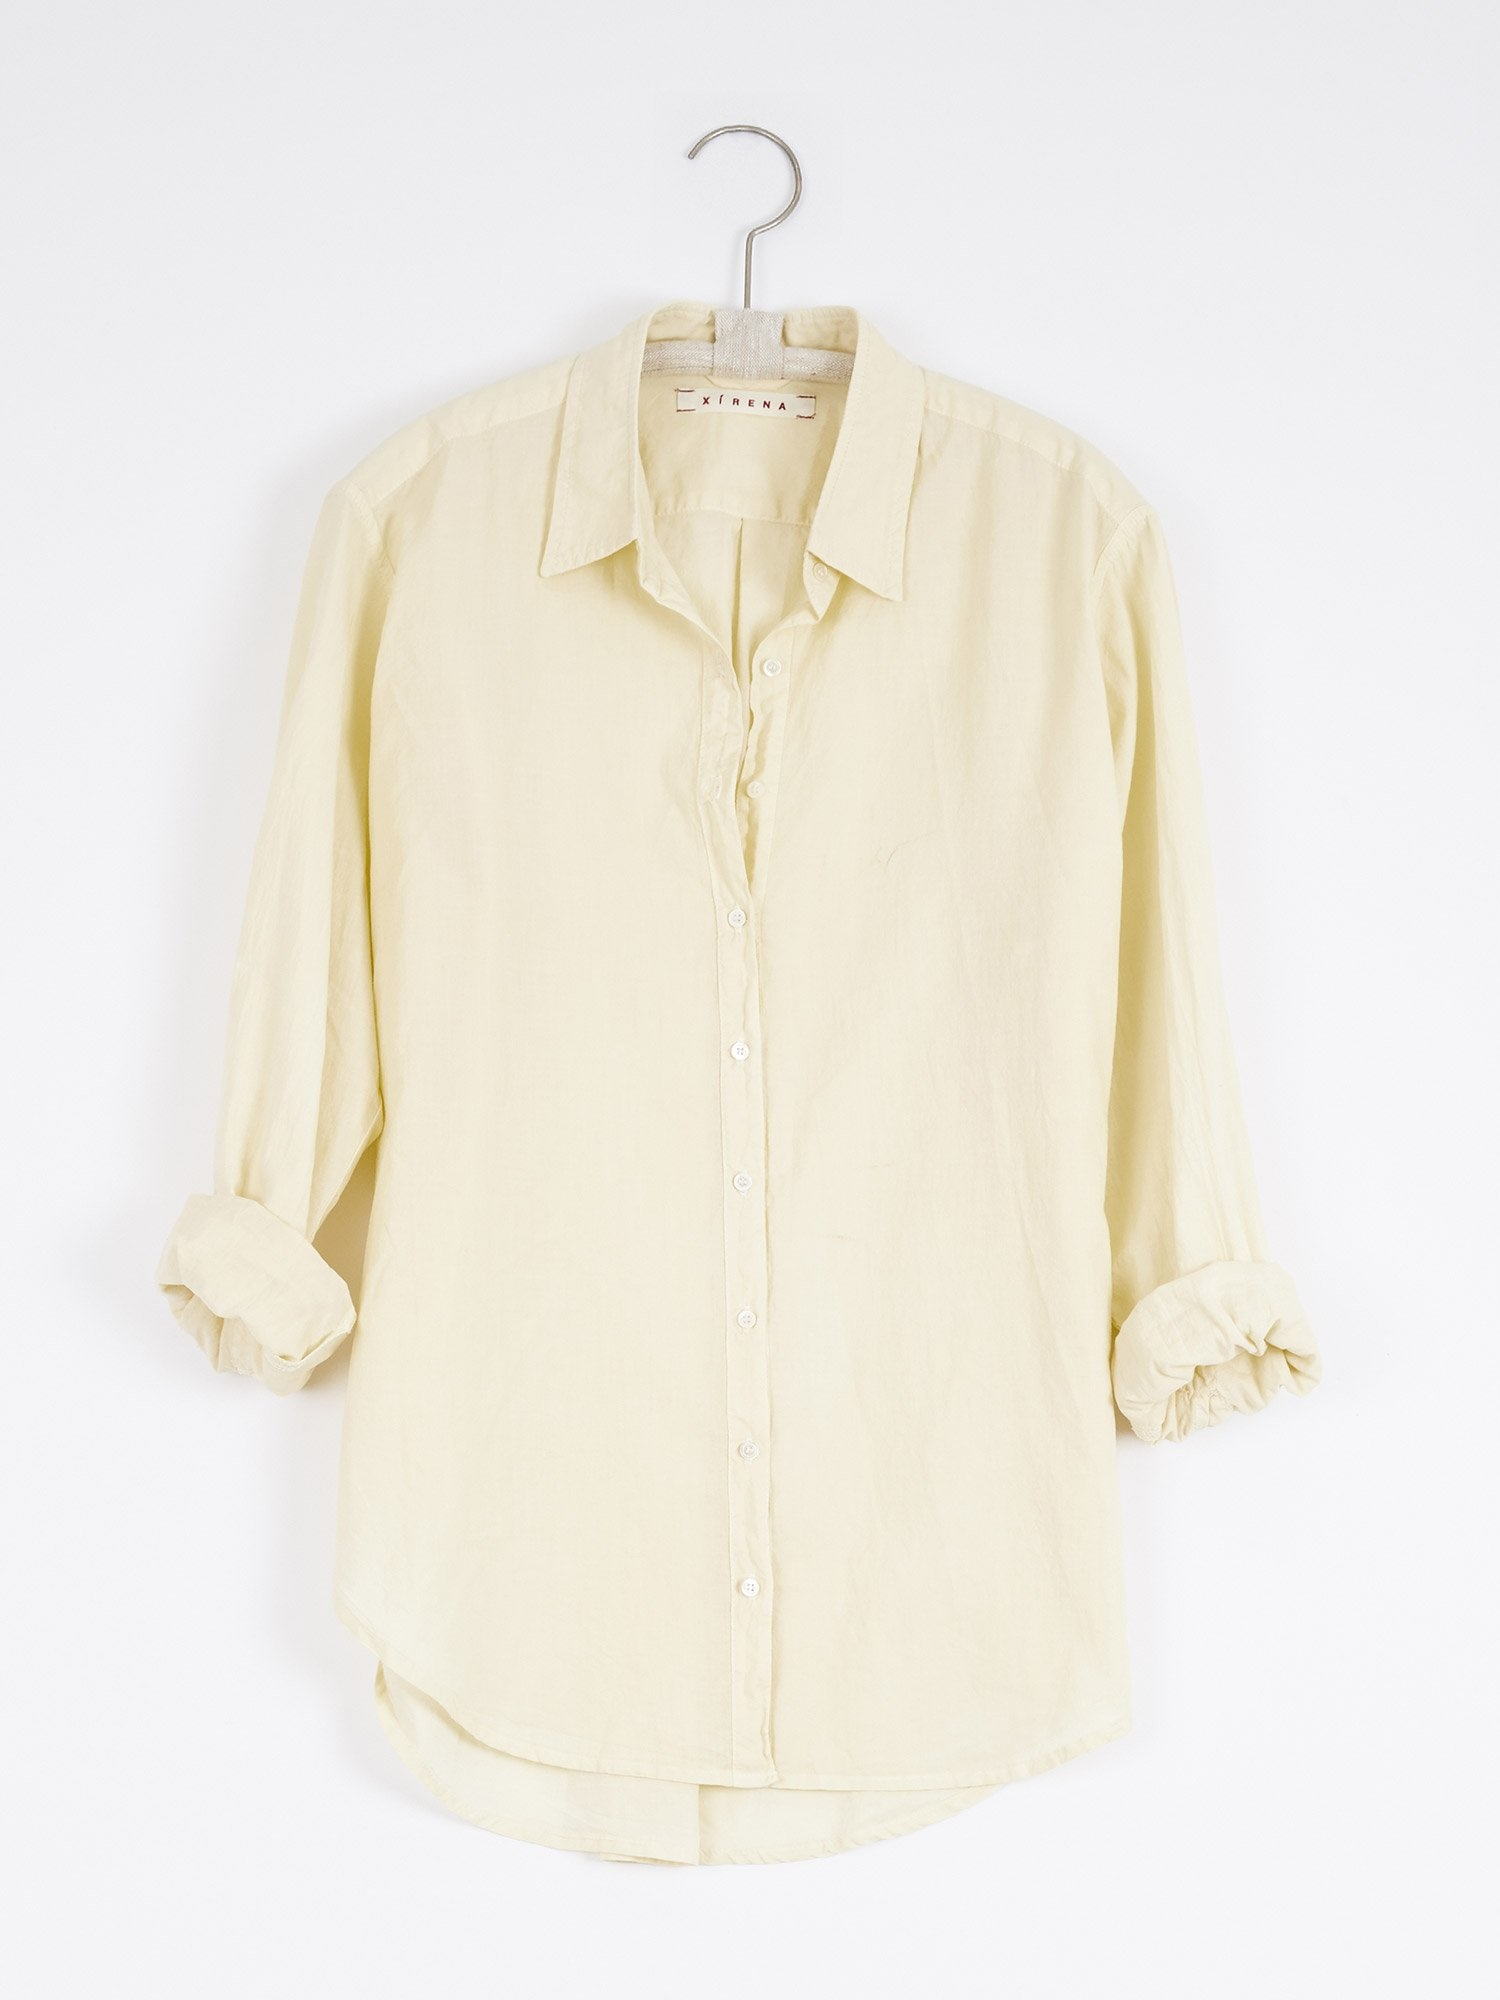 Xirena Xirena Beau Relaxed Cotton Poplin Button-Up Shirt - Multiple Colors